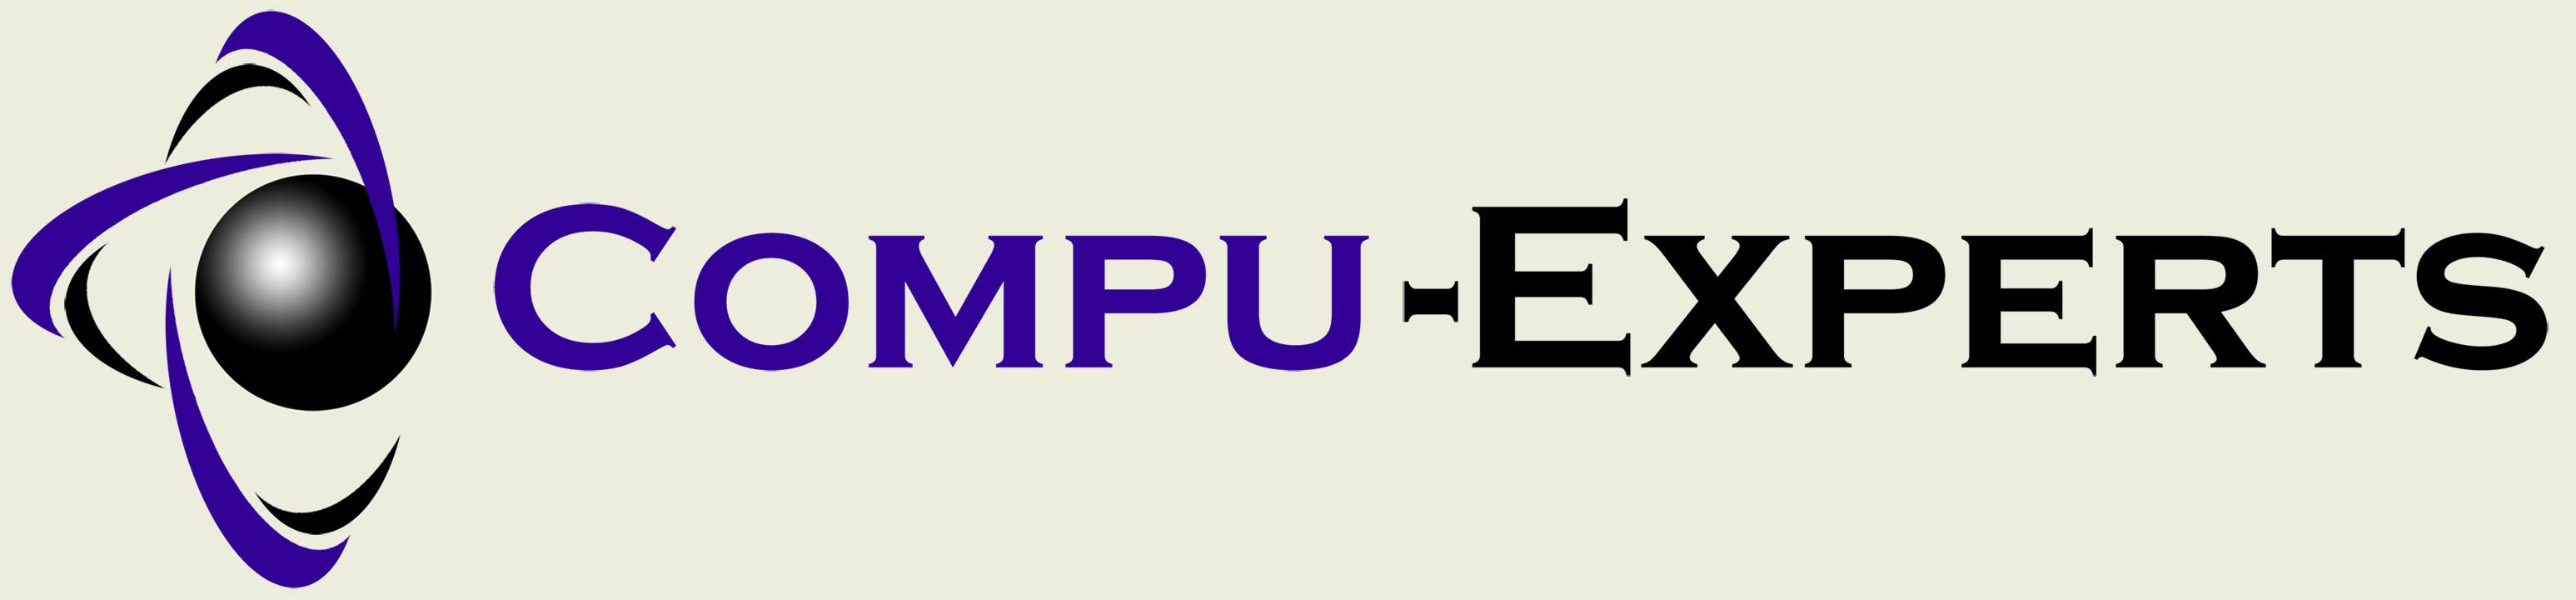 Compu-Experts